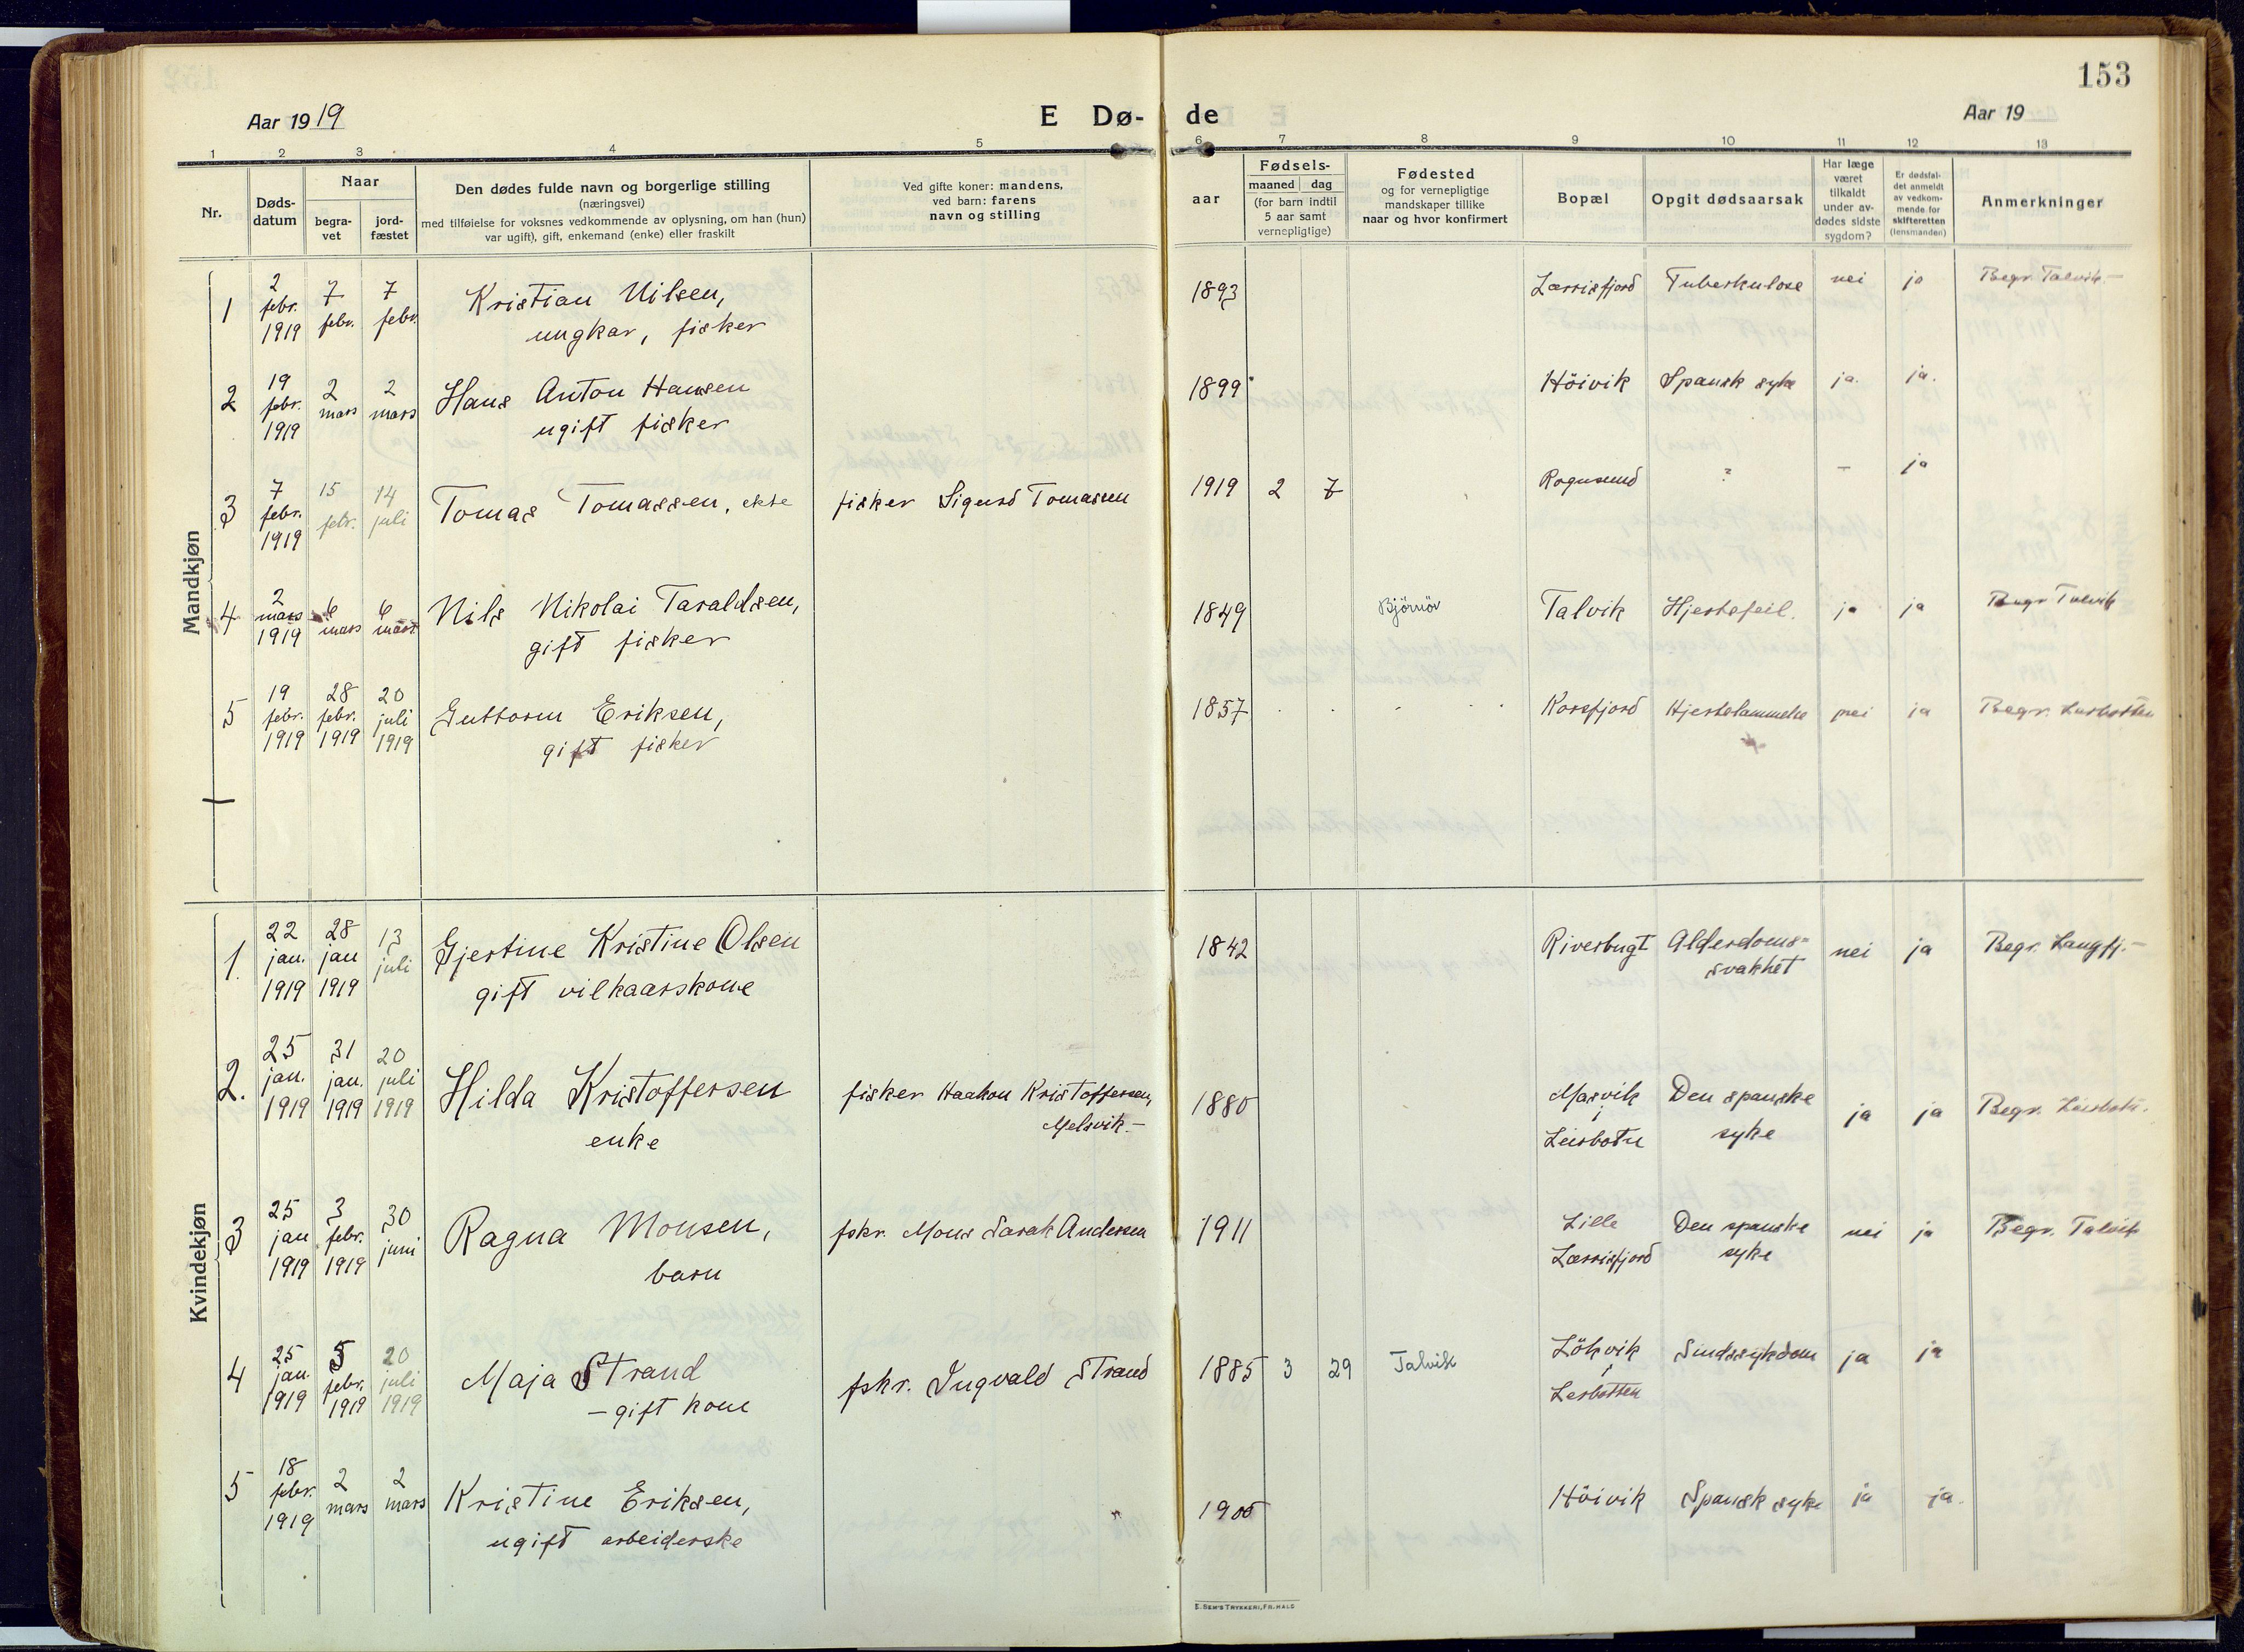 SATØ, Talvik sokneprestkontor, H/Ha/L0018kirke: Ministerialbok nr. 18, 1915-1924, s. 153